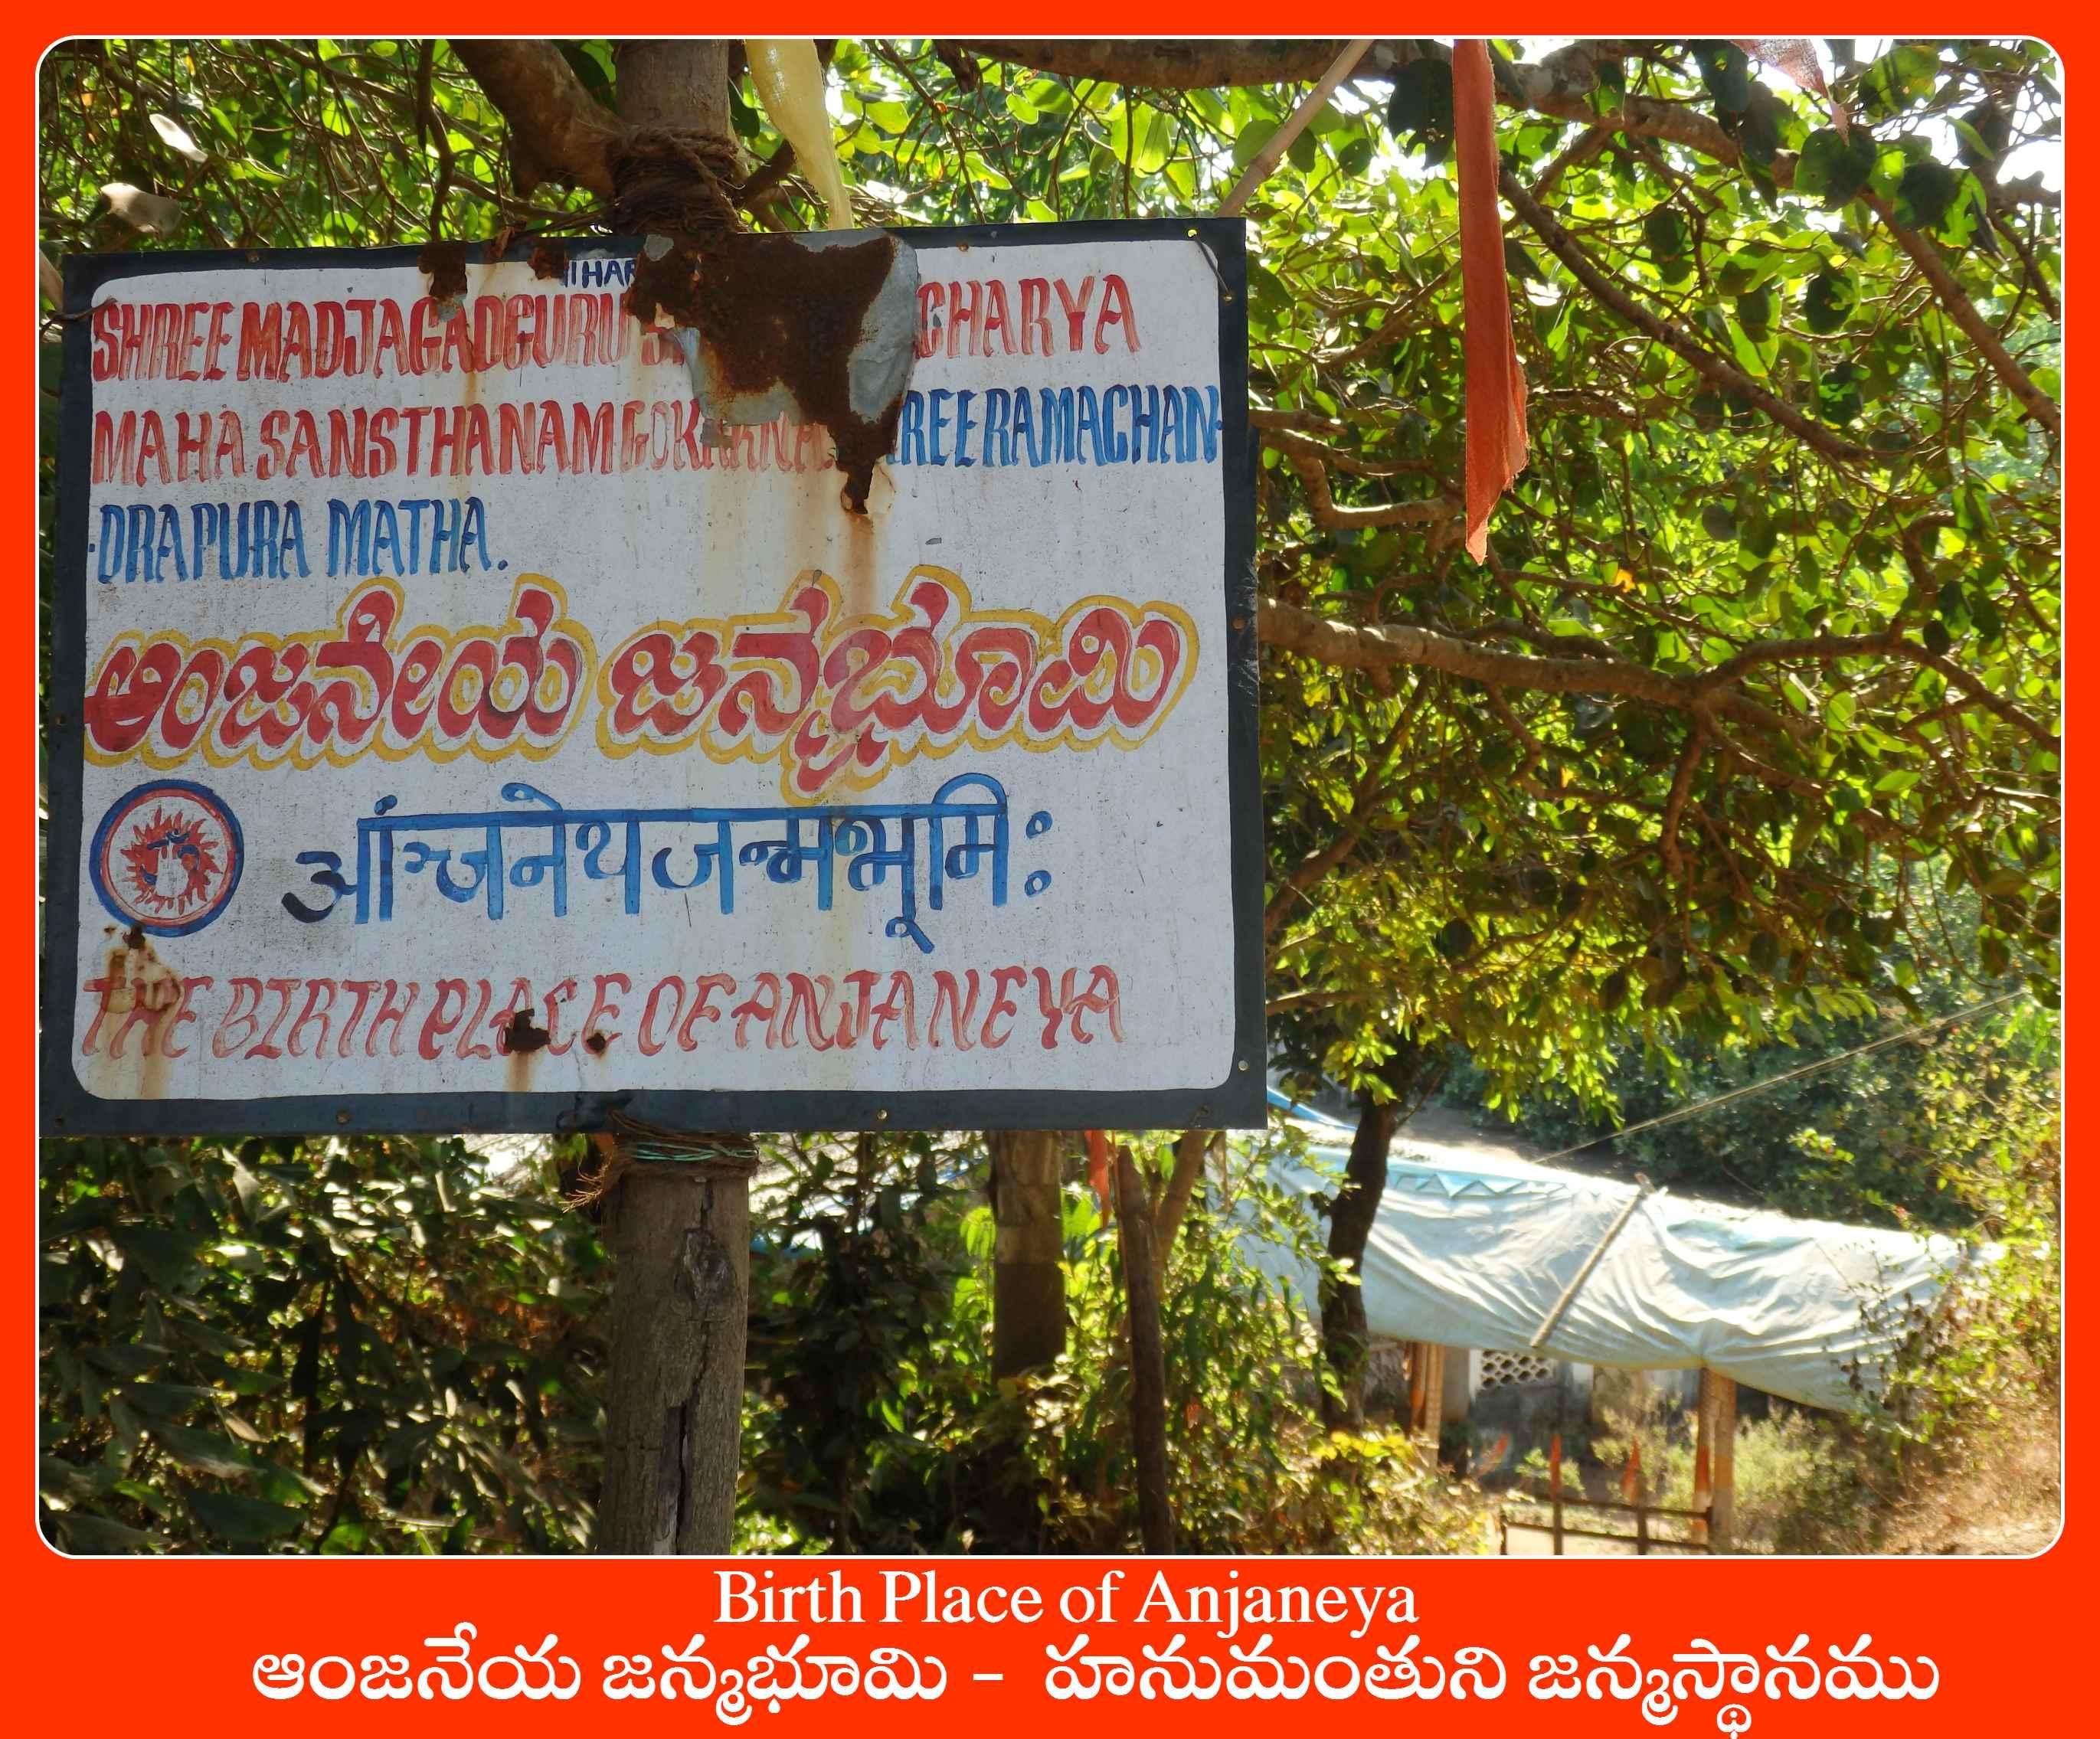 Birth Place of Anjaneya - Gokarna